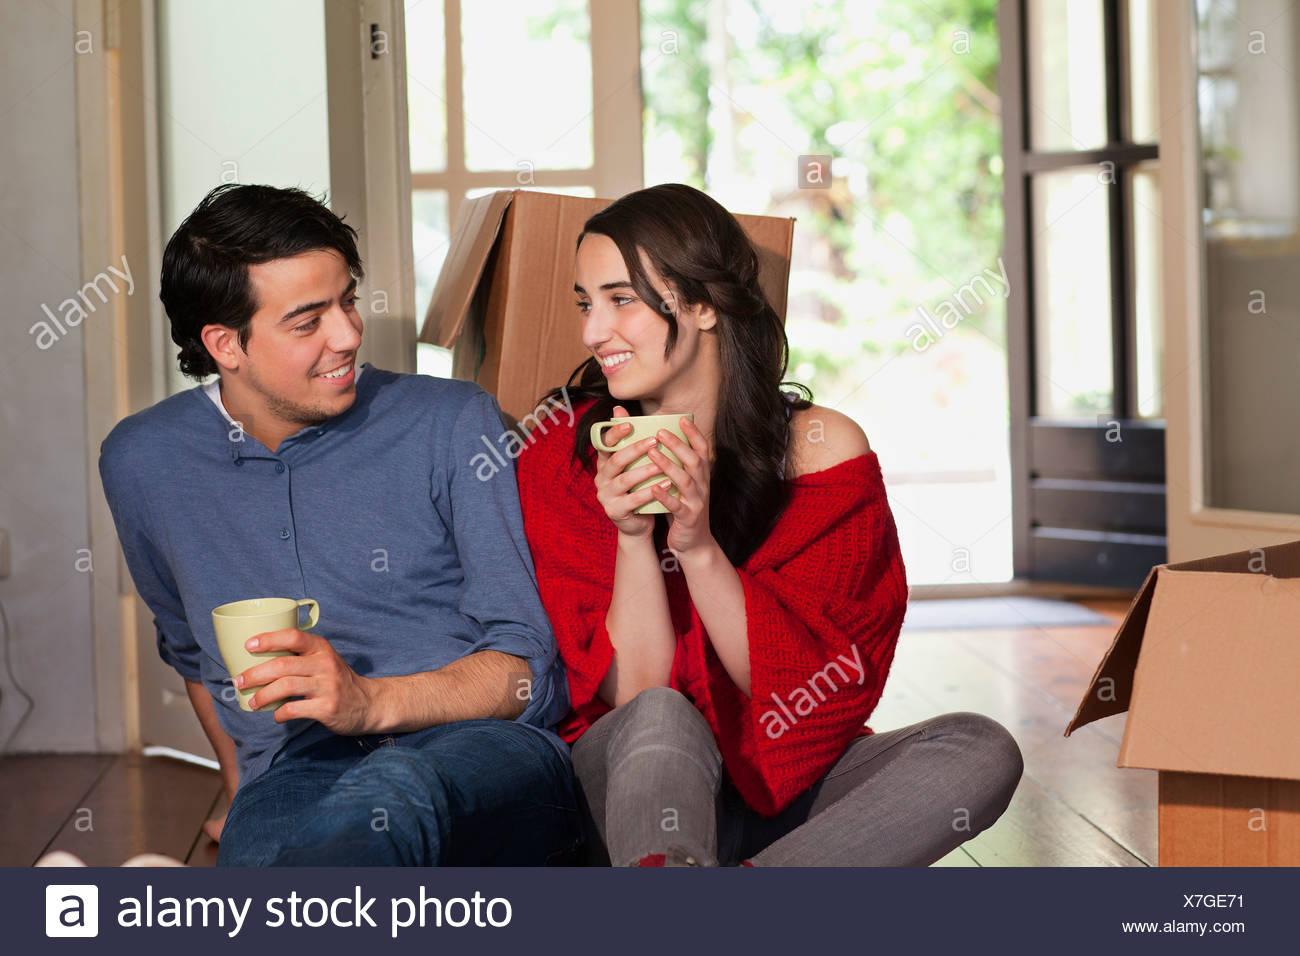 Junges Paar mit Kaffeepause während Umzug Stockbild